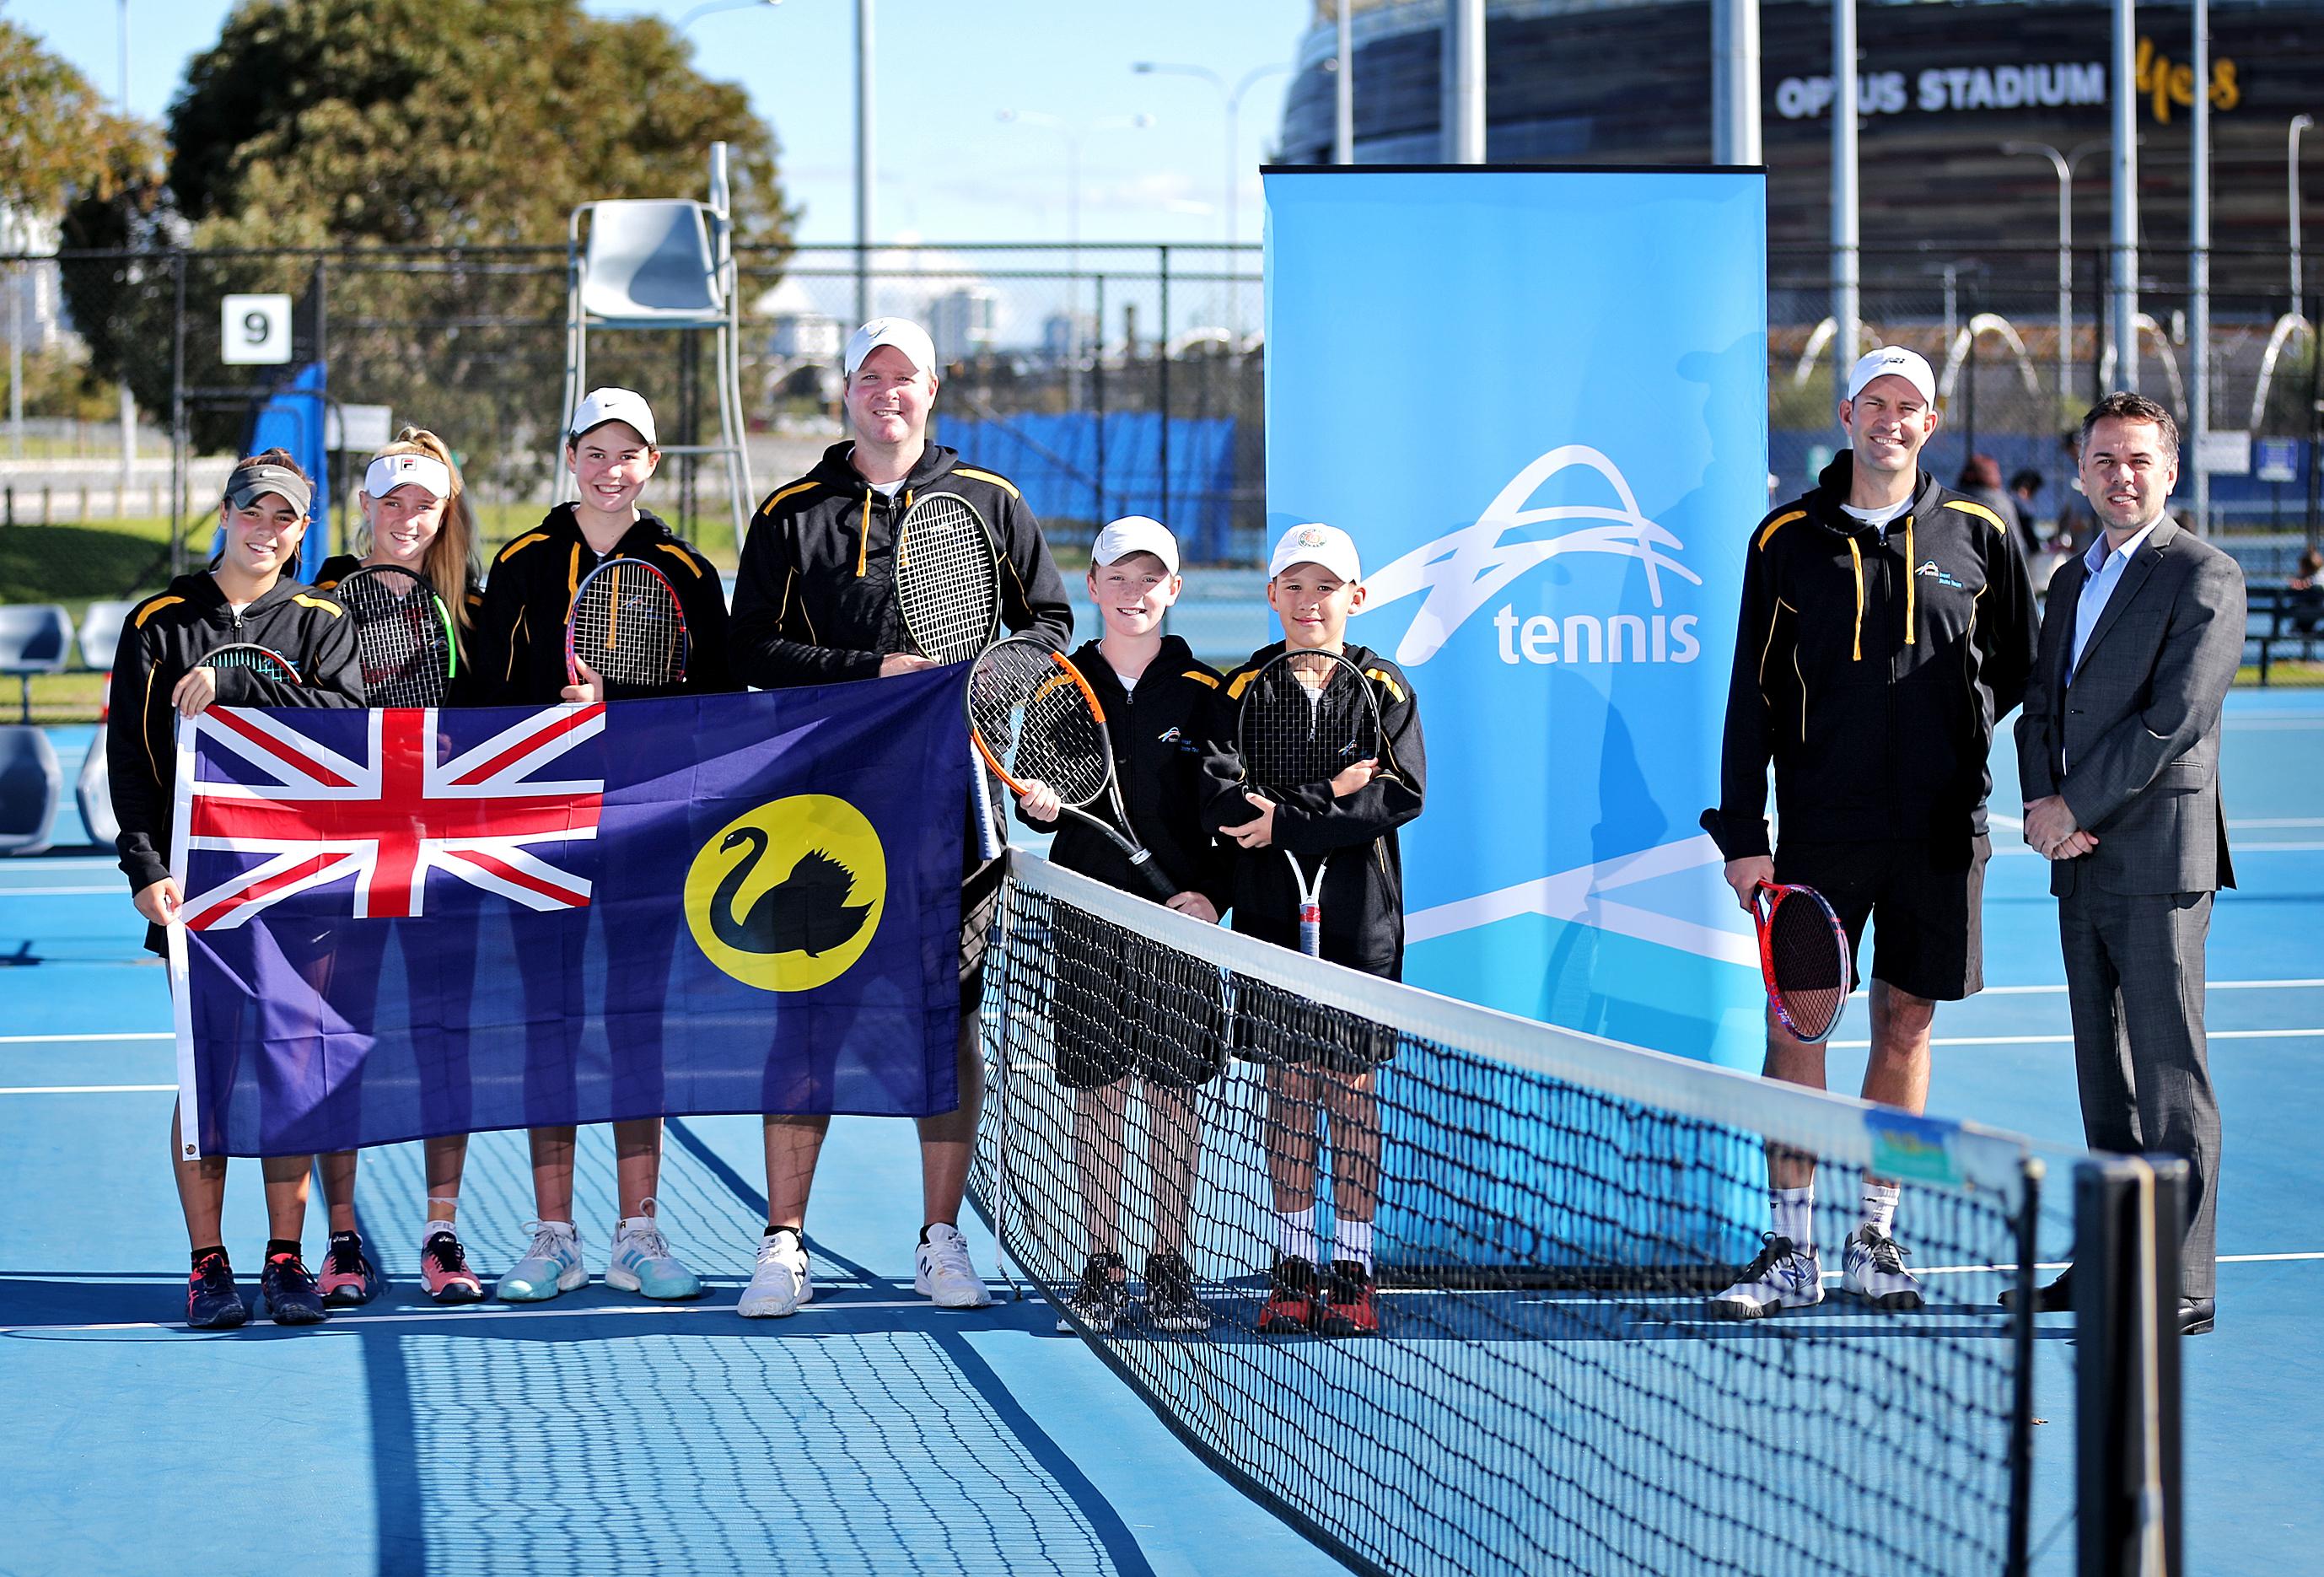 WA juniors claim two tennis championships | Community News Group